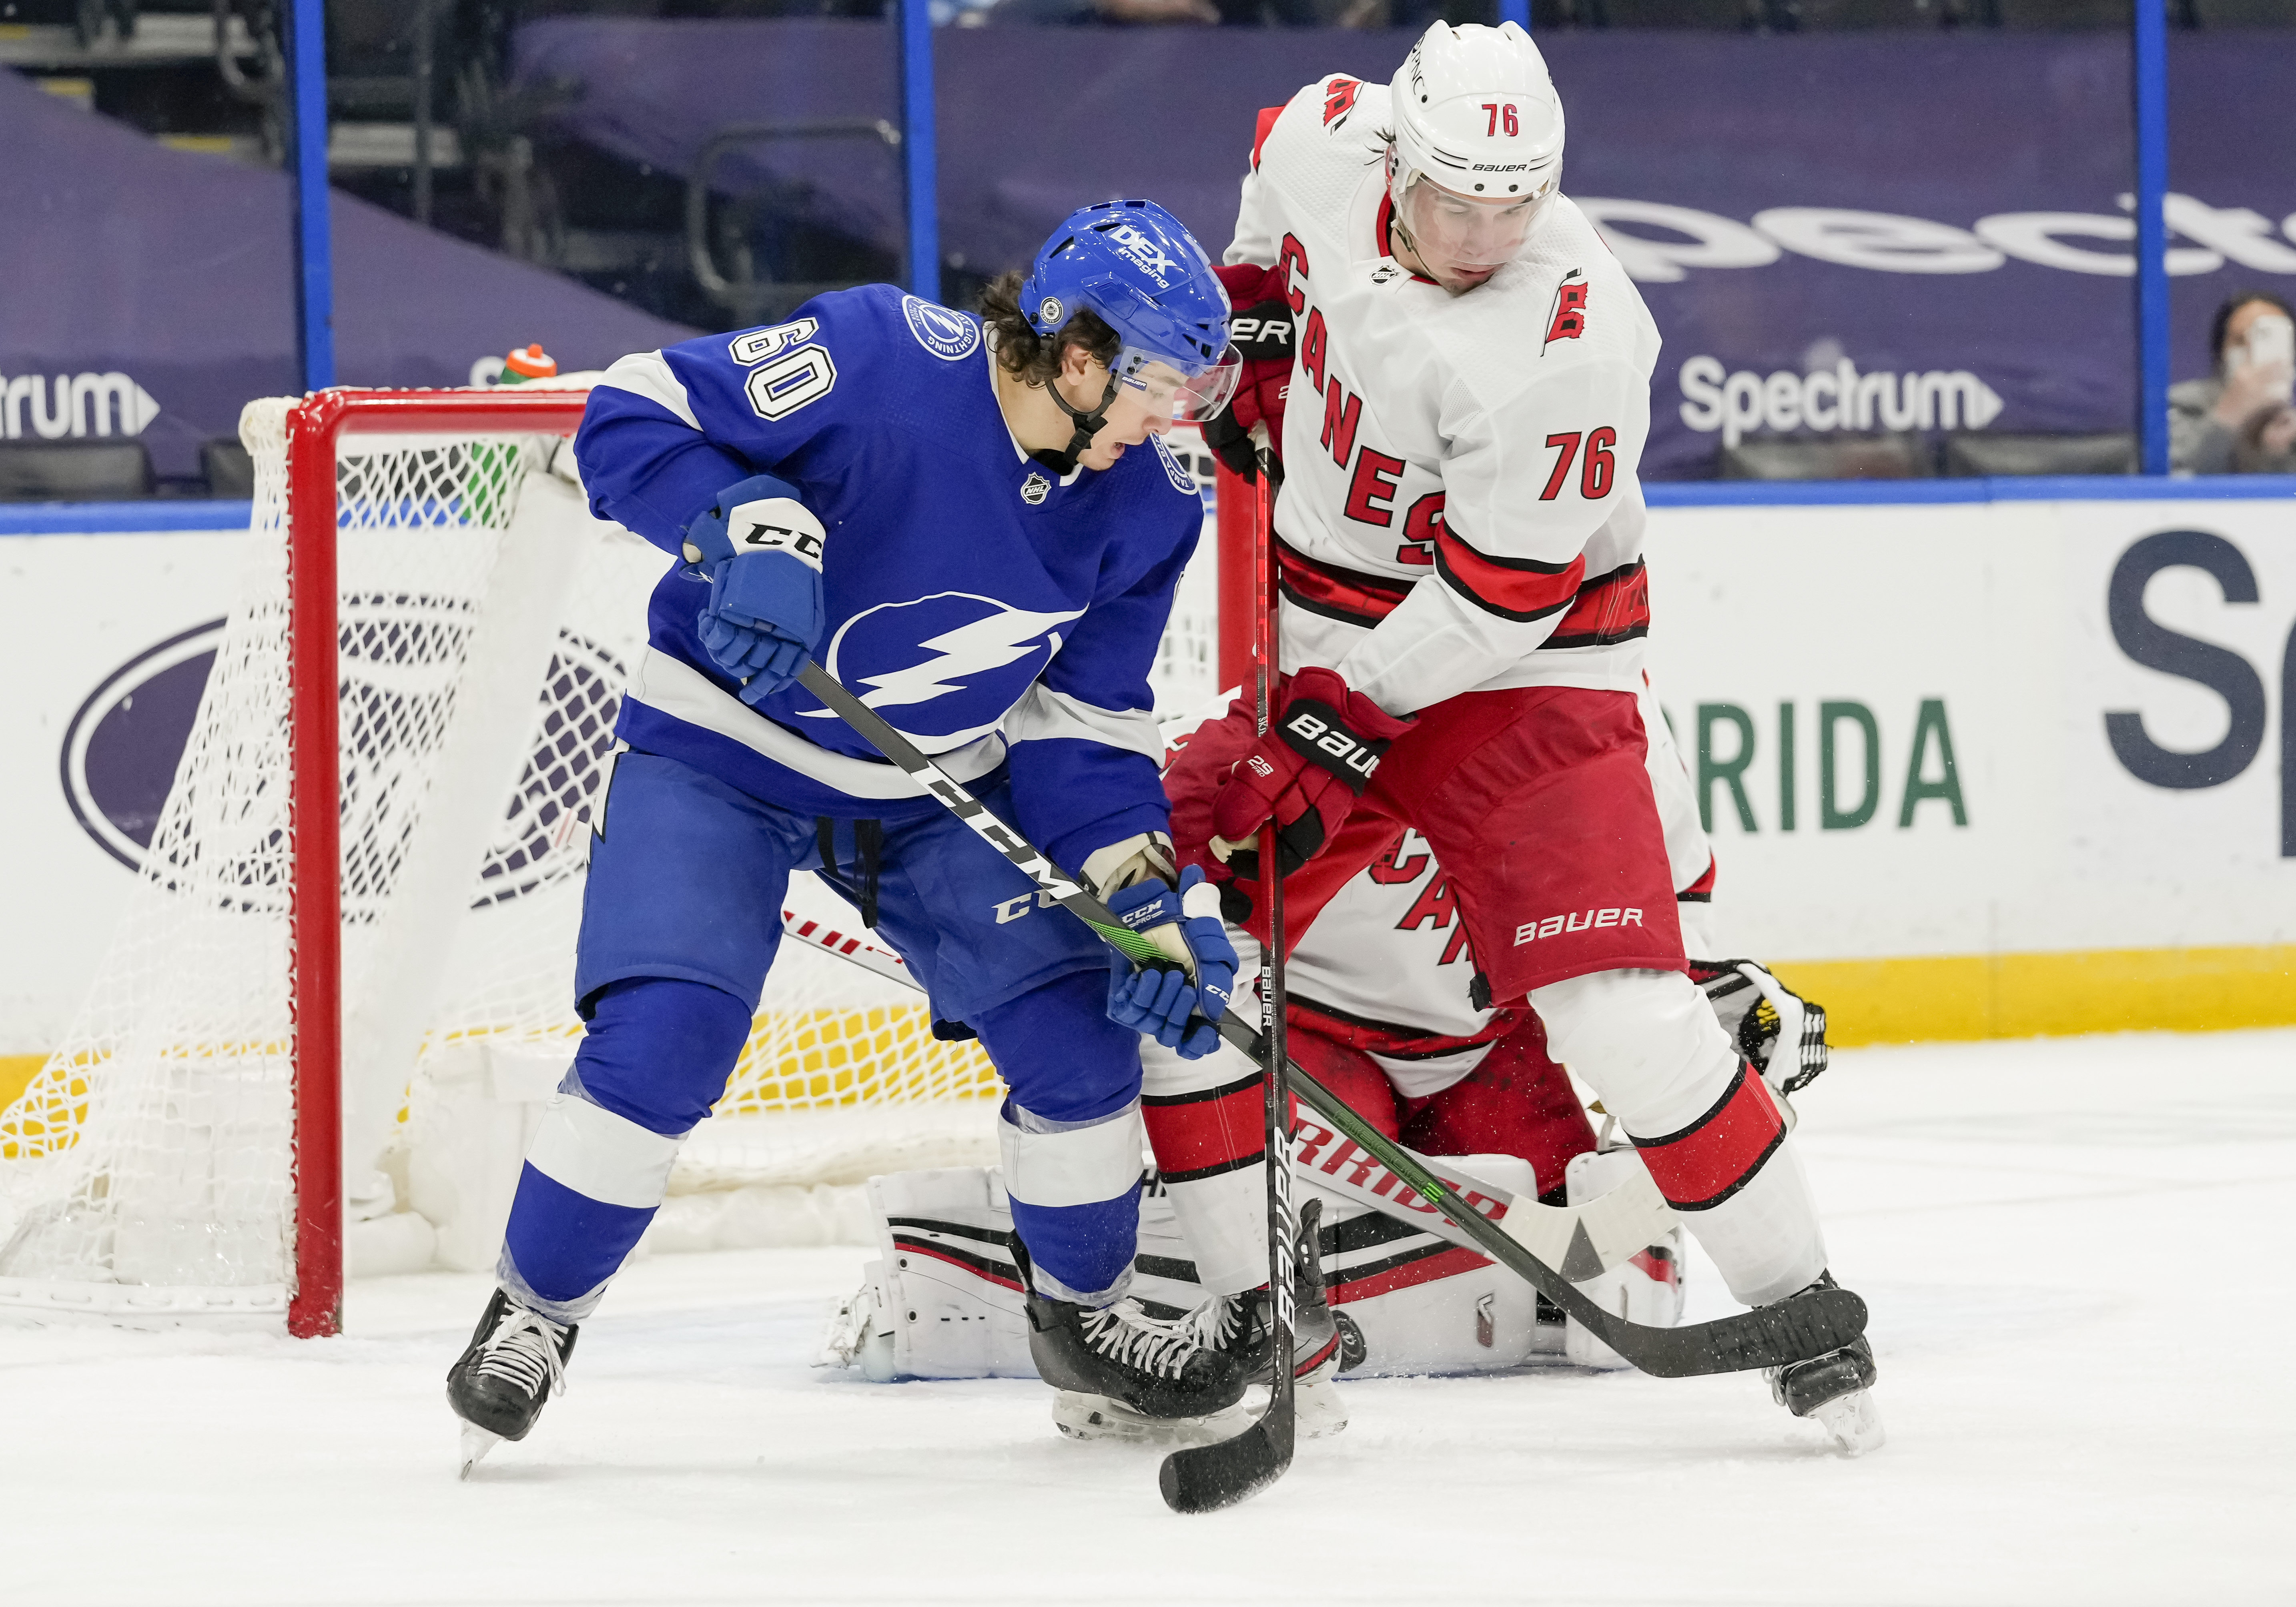 NHL: APR 19 Hurricanes at Lightning